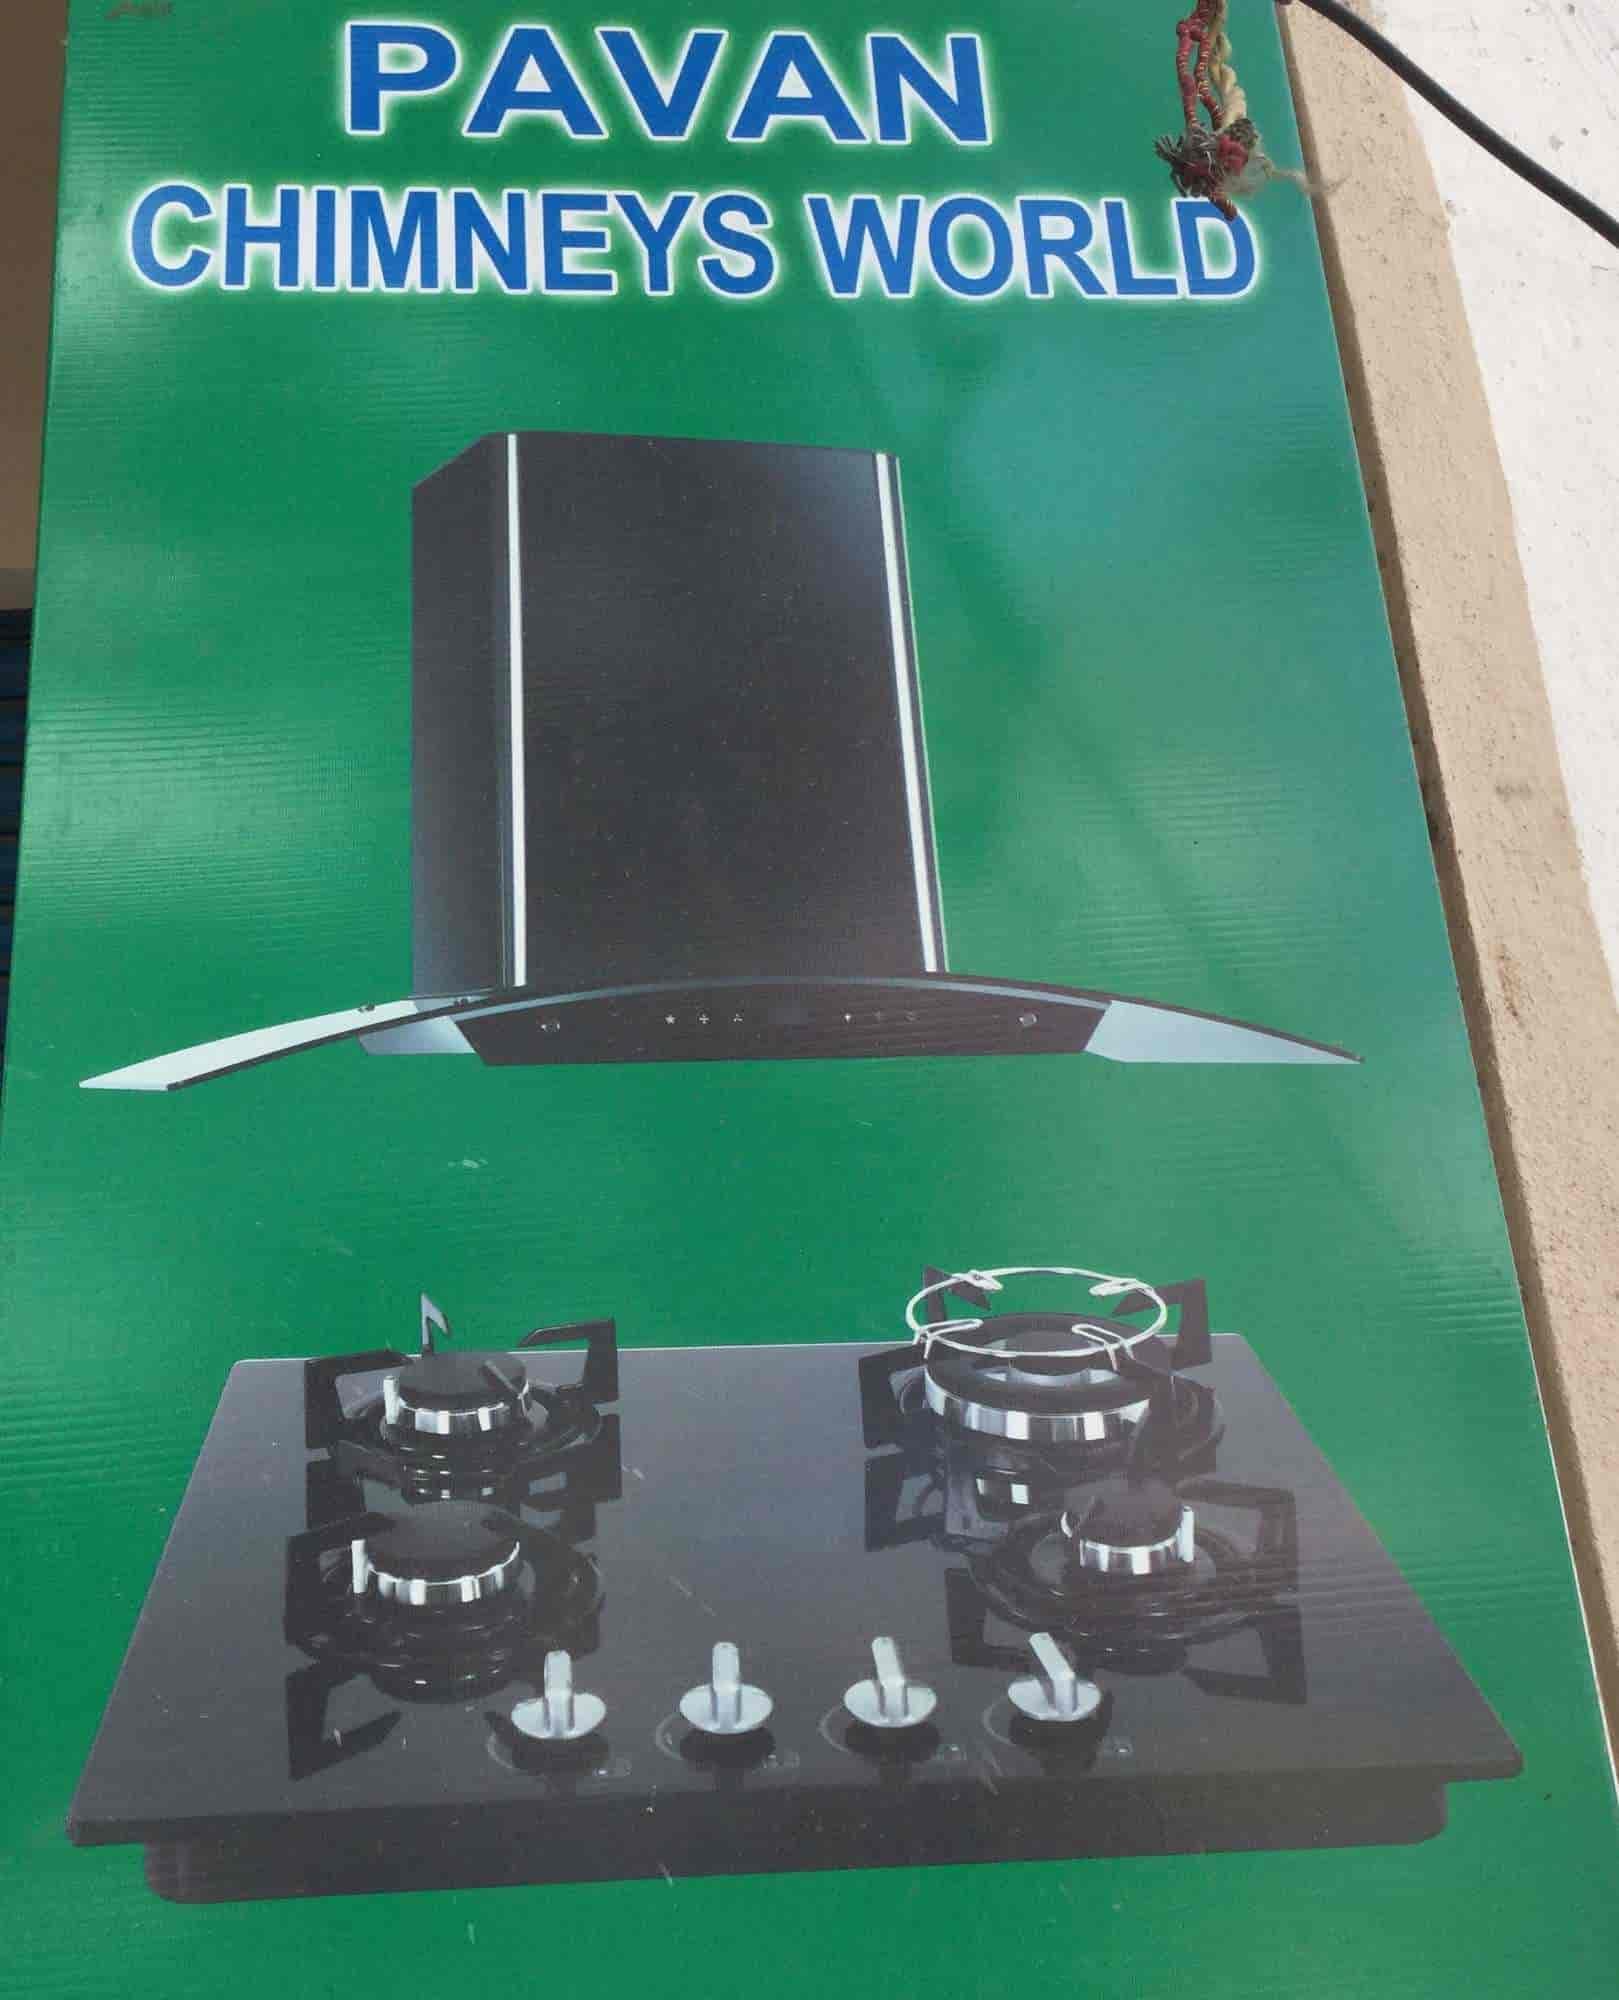 Pavan Chimneys World, Arundalpet - Pawan Chimney World - Electric ...